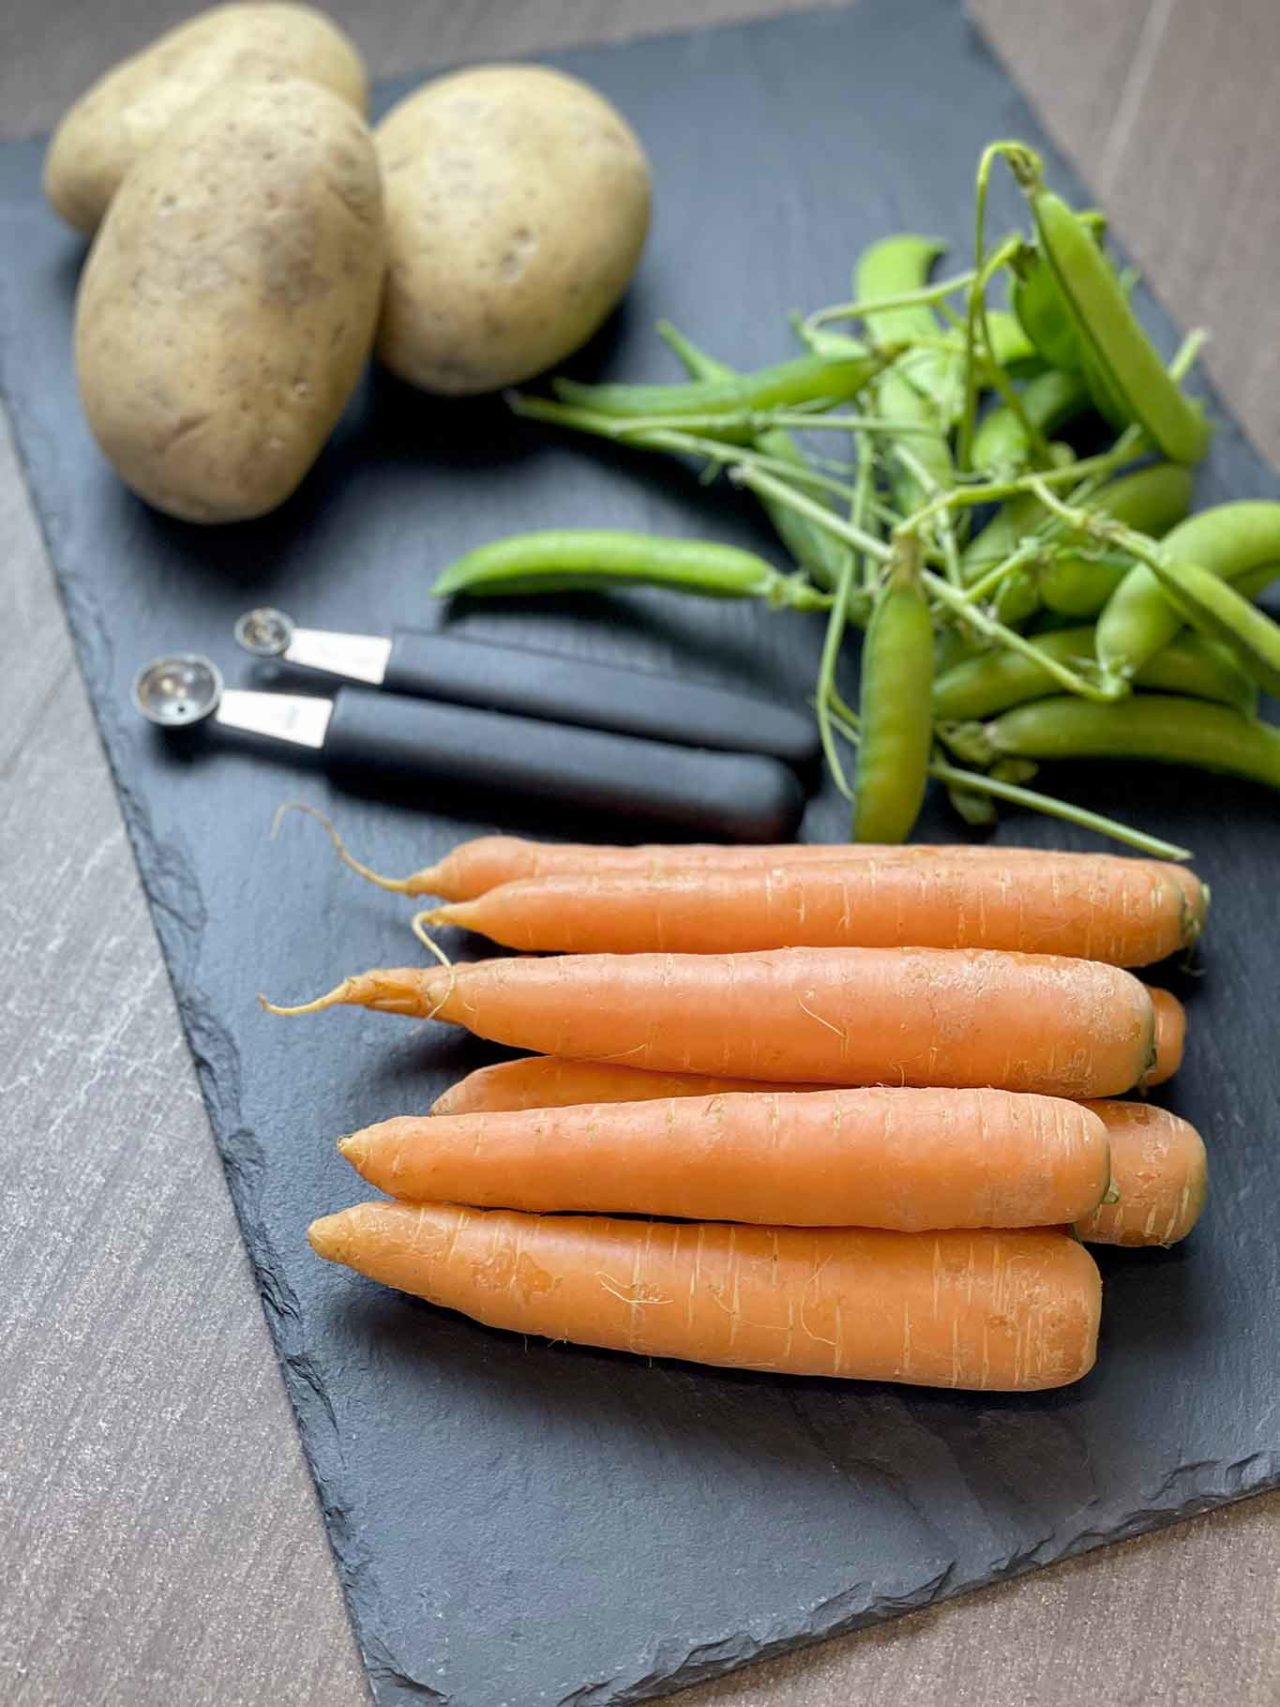 patate carote piselli